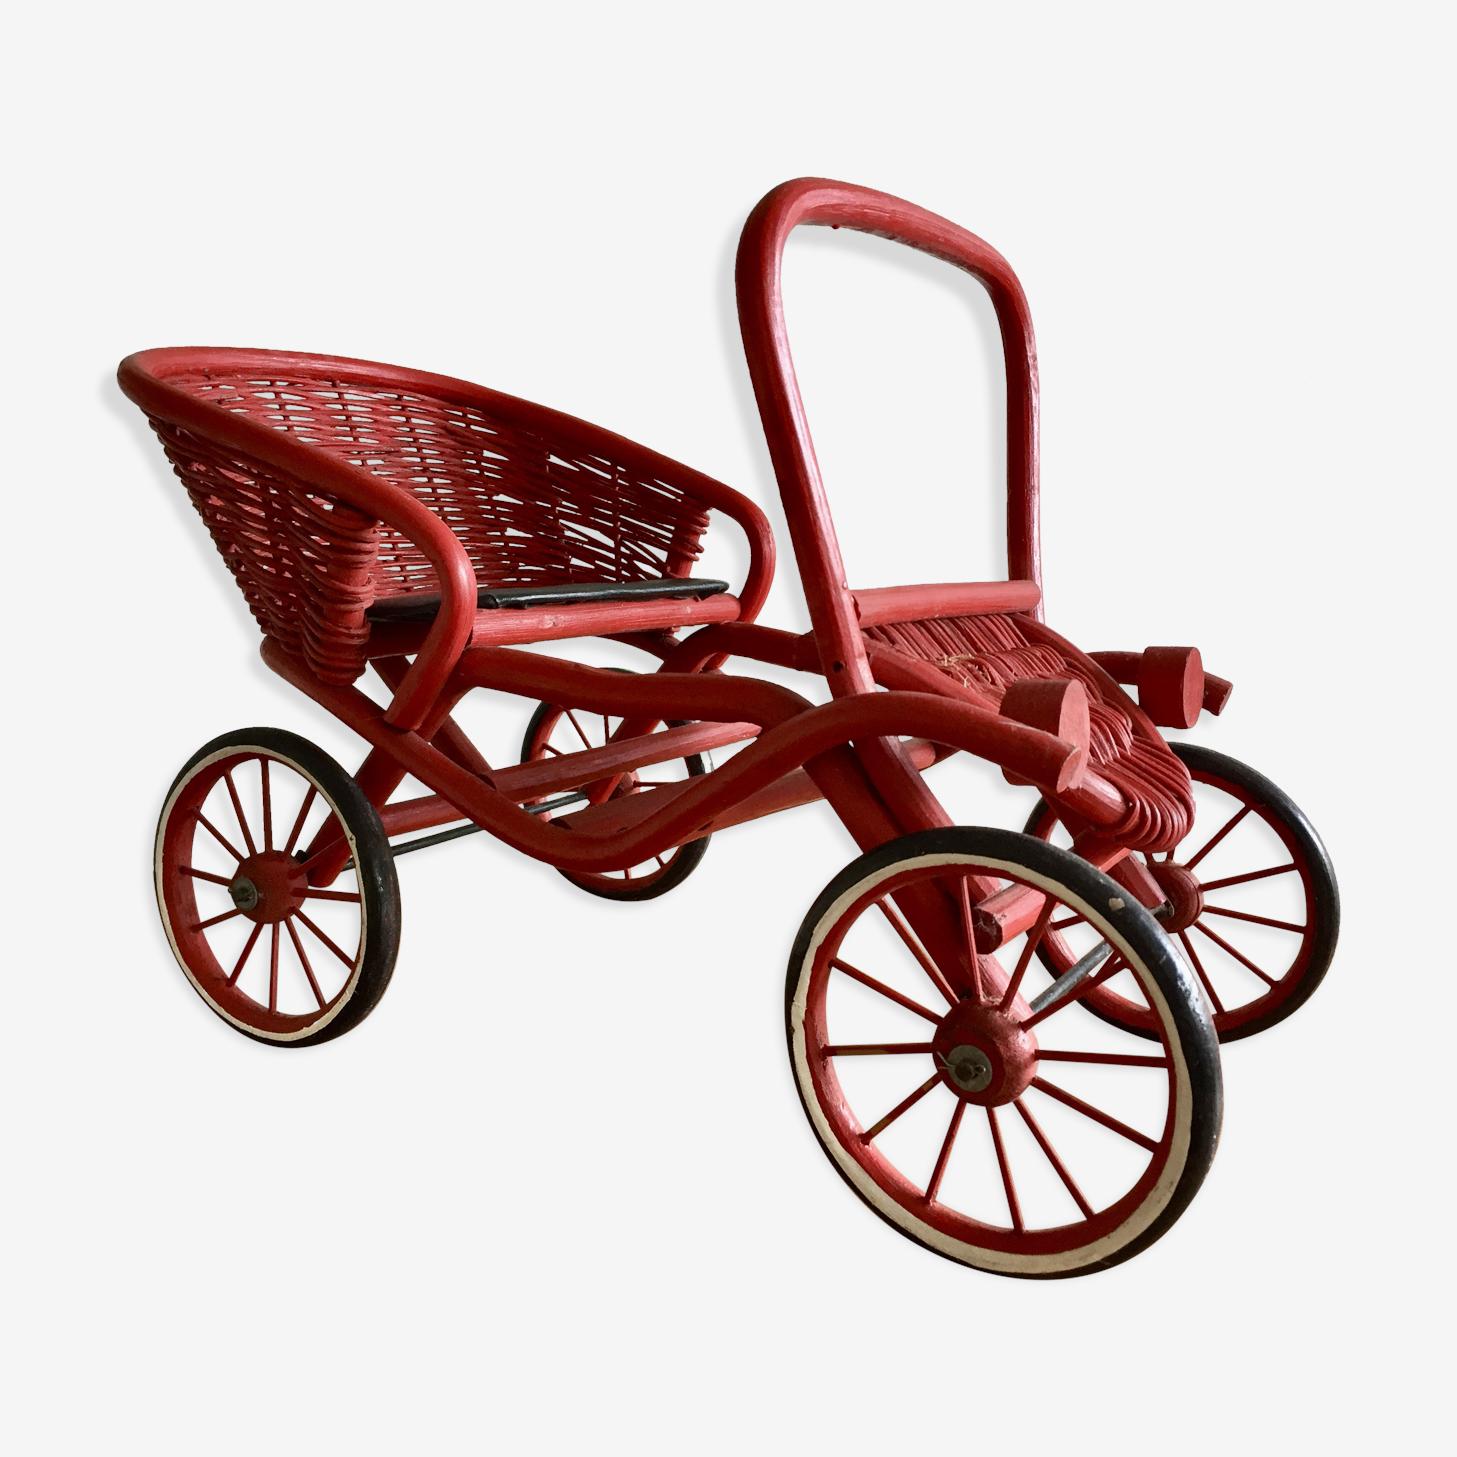 Classic rattan red car